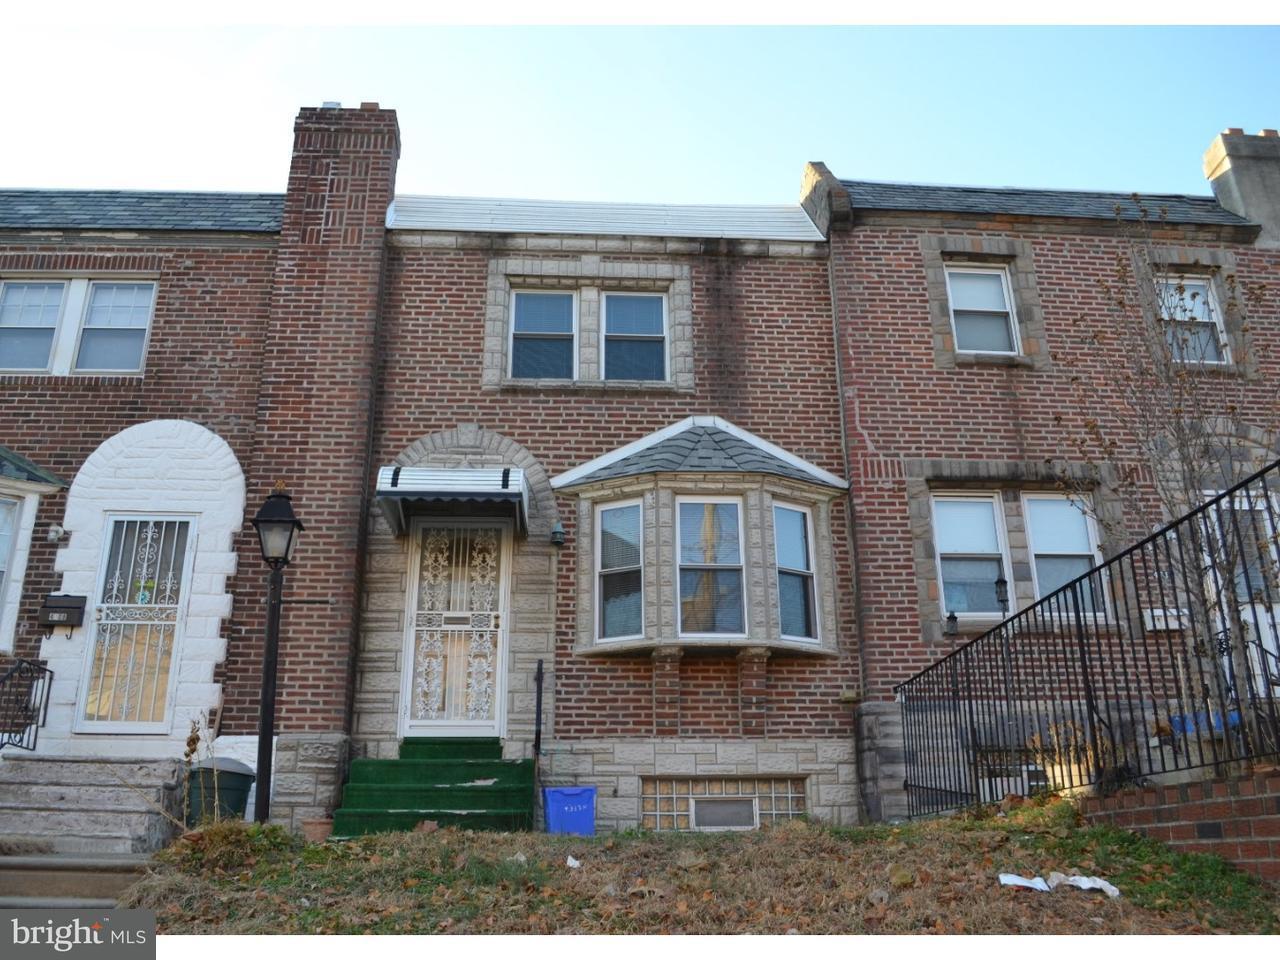 4310  M Philadelphia , PA 19124